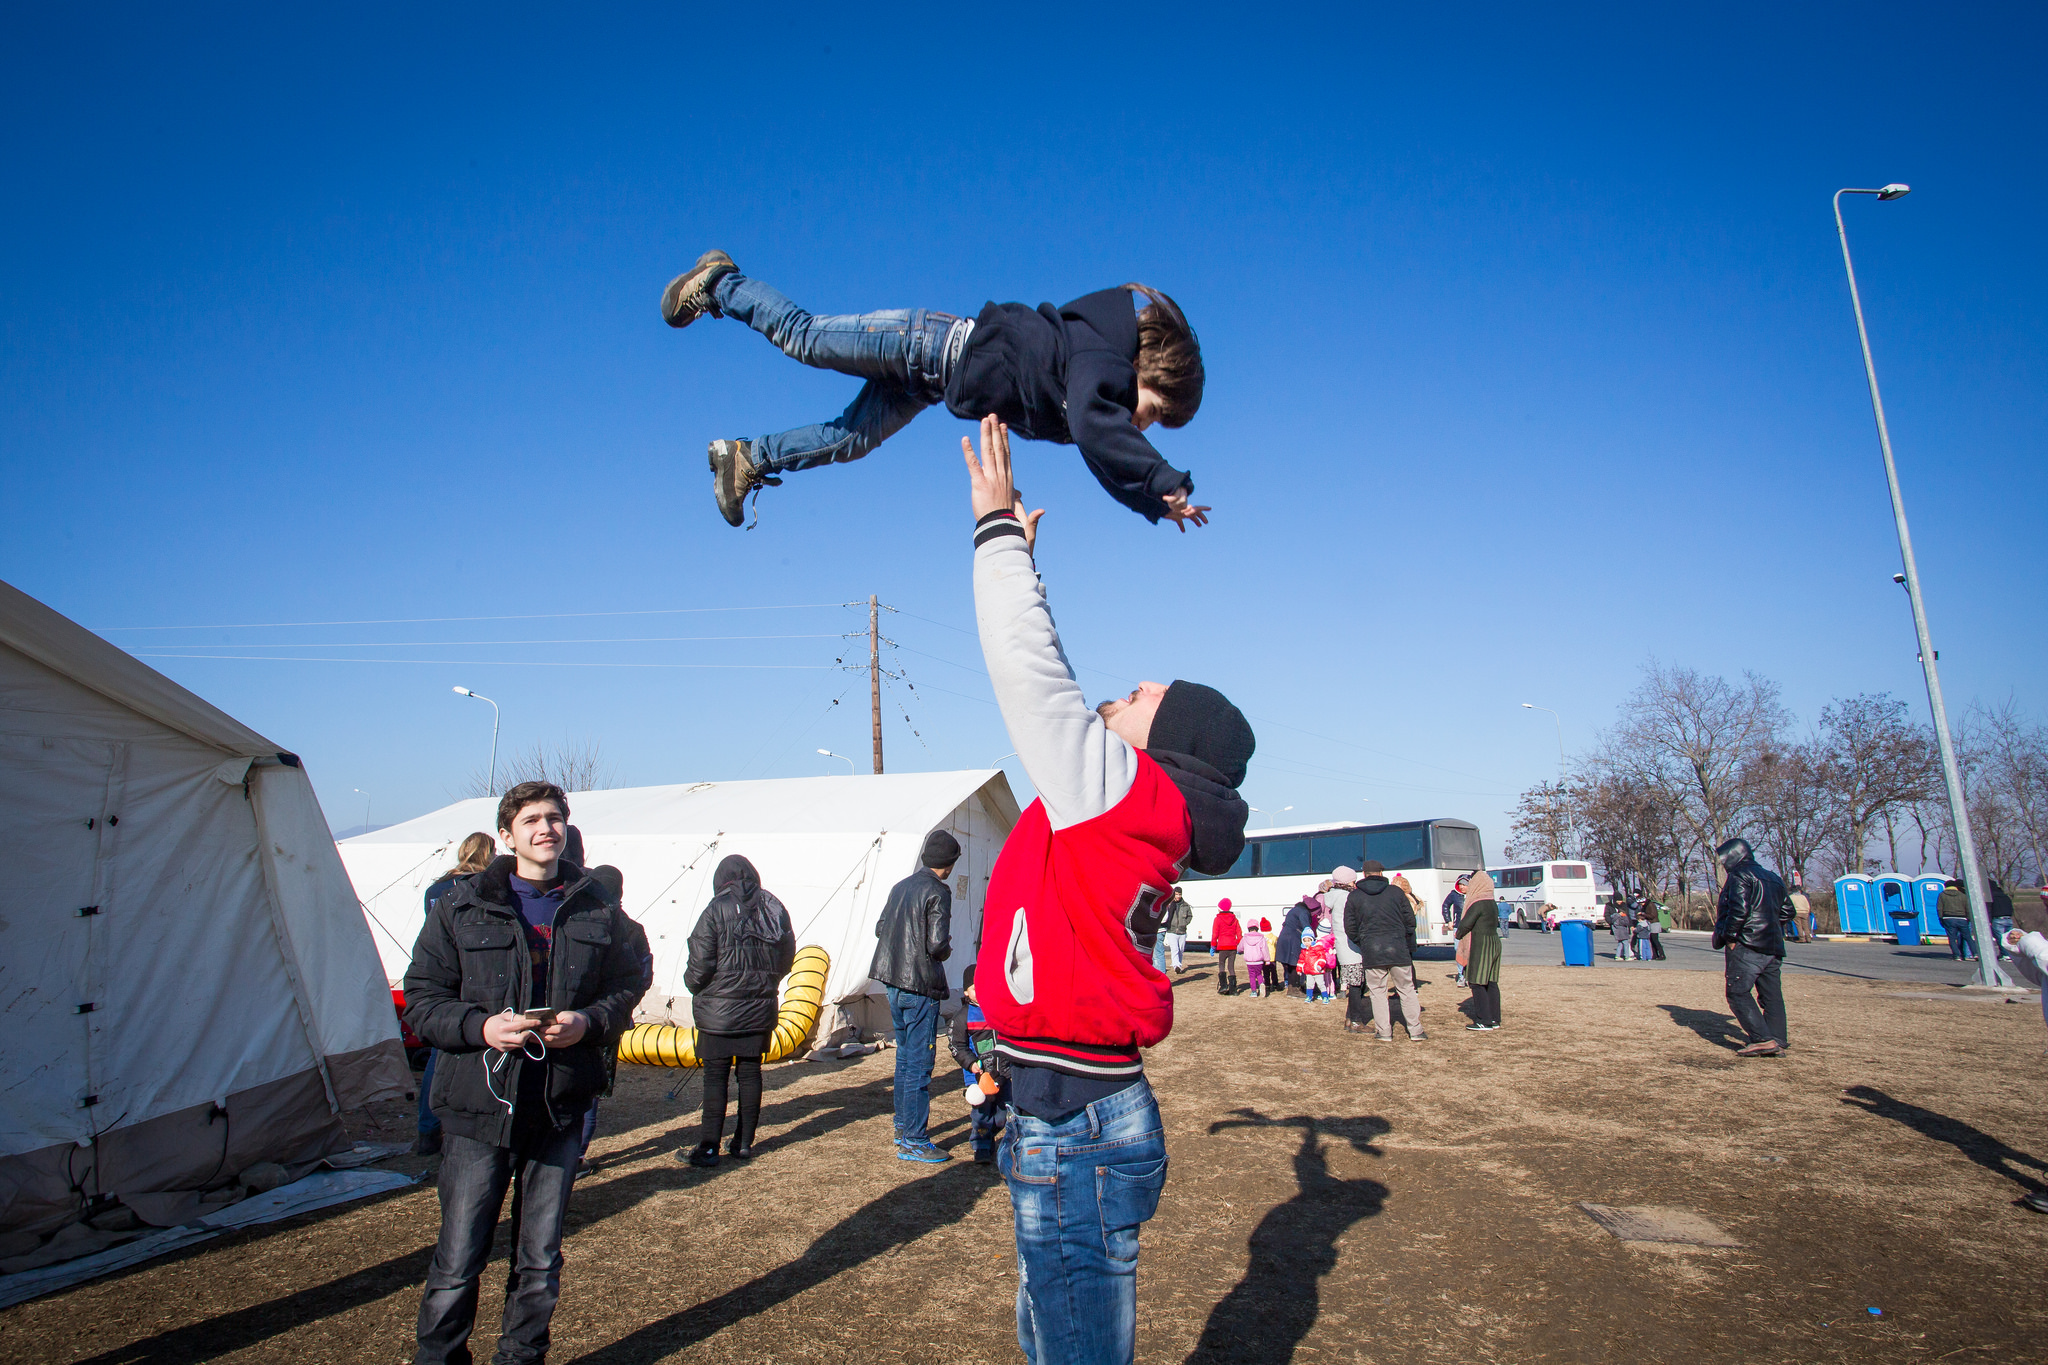 Refugees play at a camp along the Greece-Macedonia border.. (Photo by Natalia Tsoukala and Caritas International/Flickr Creative Commons)